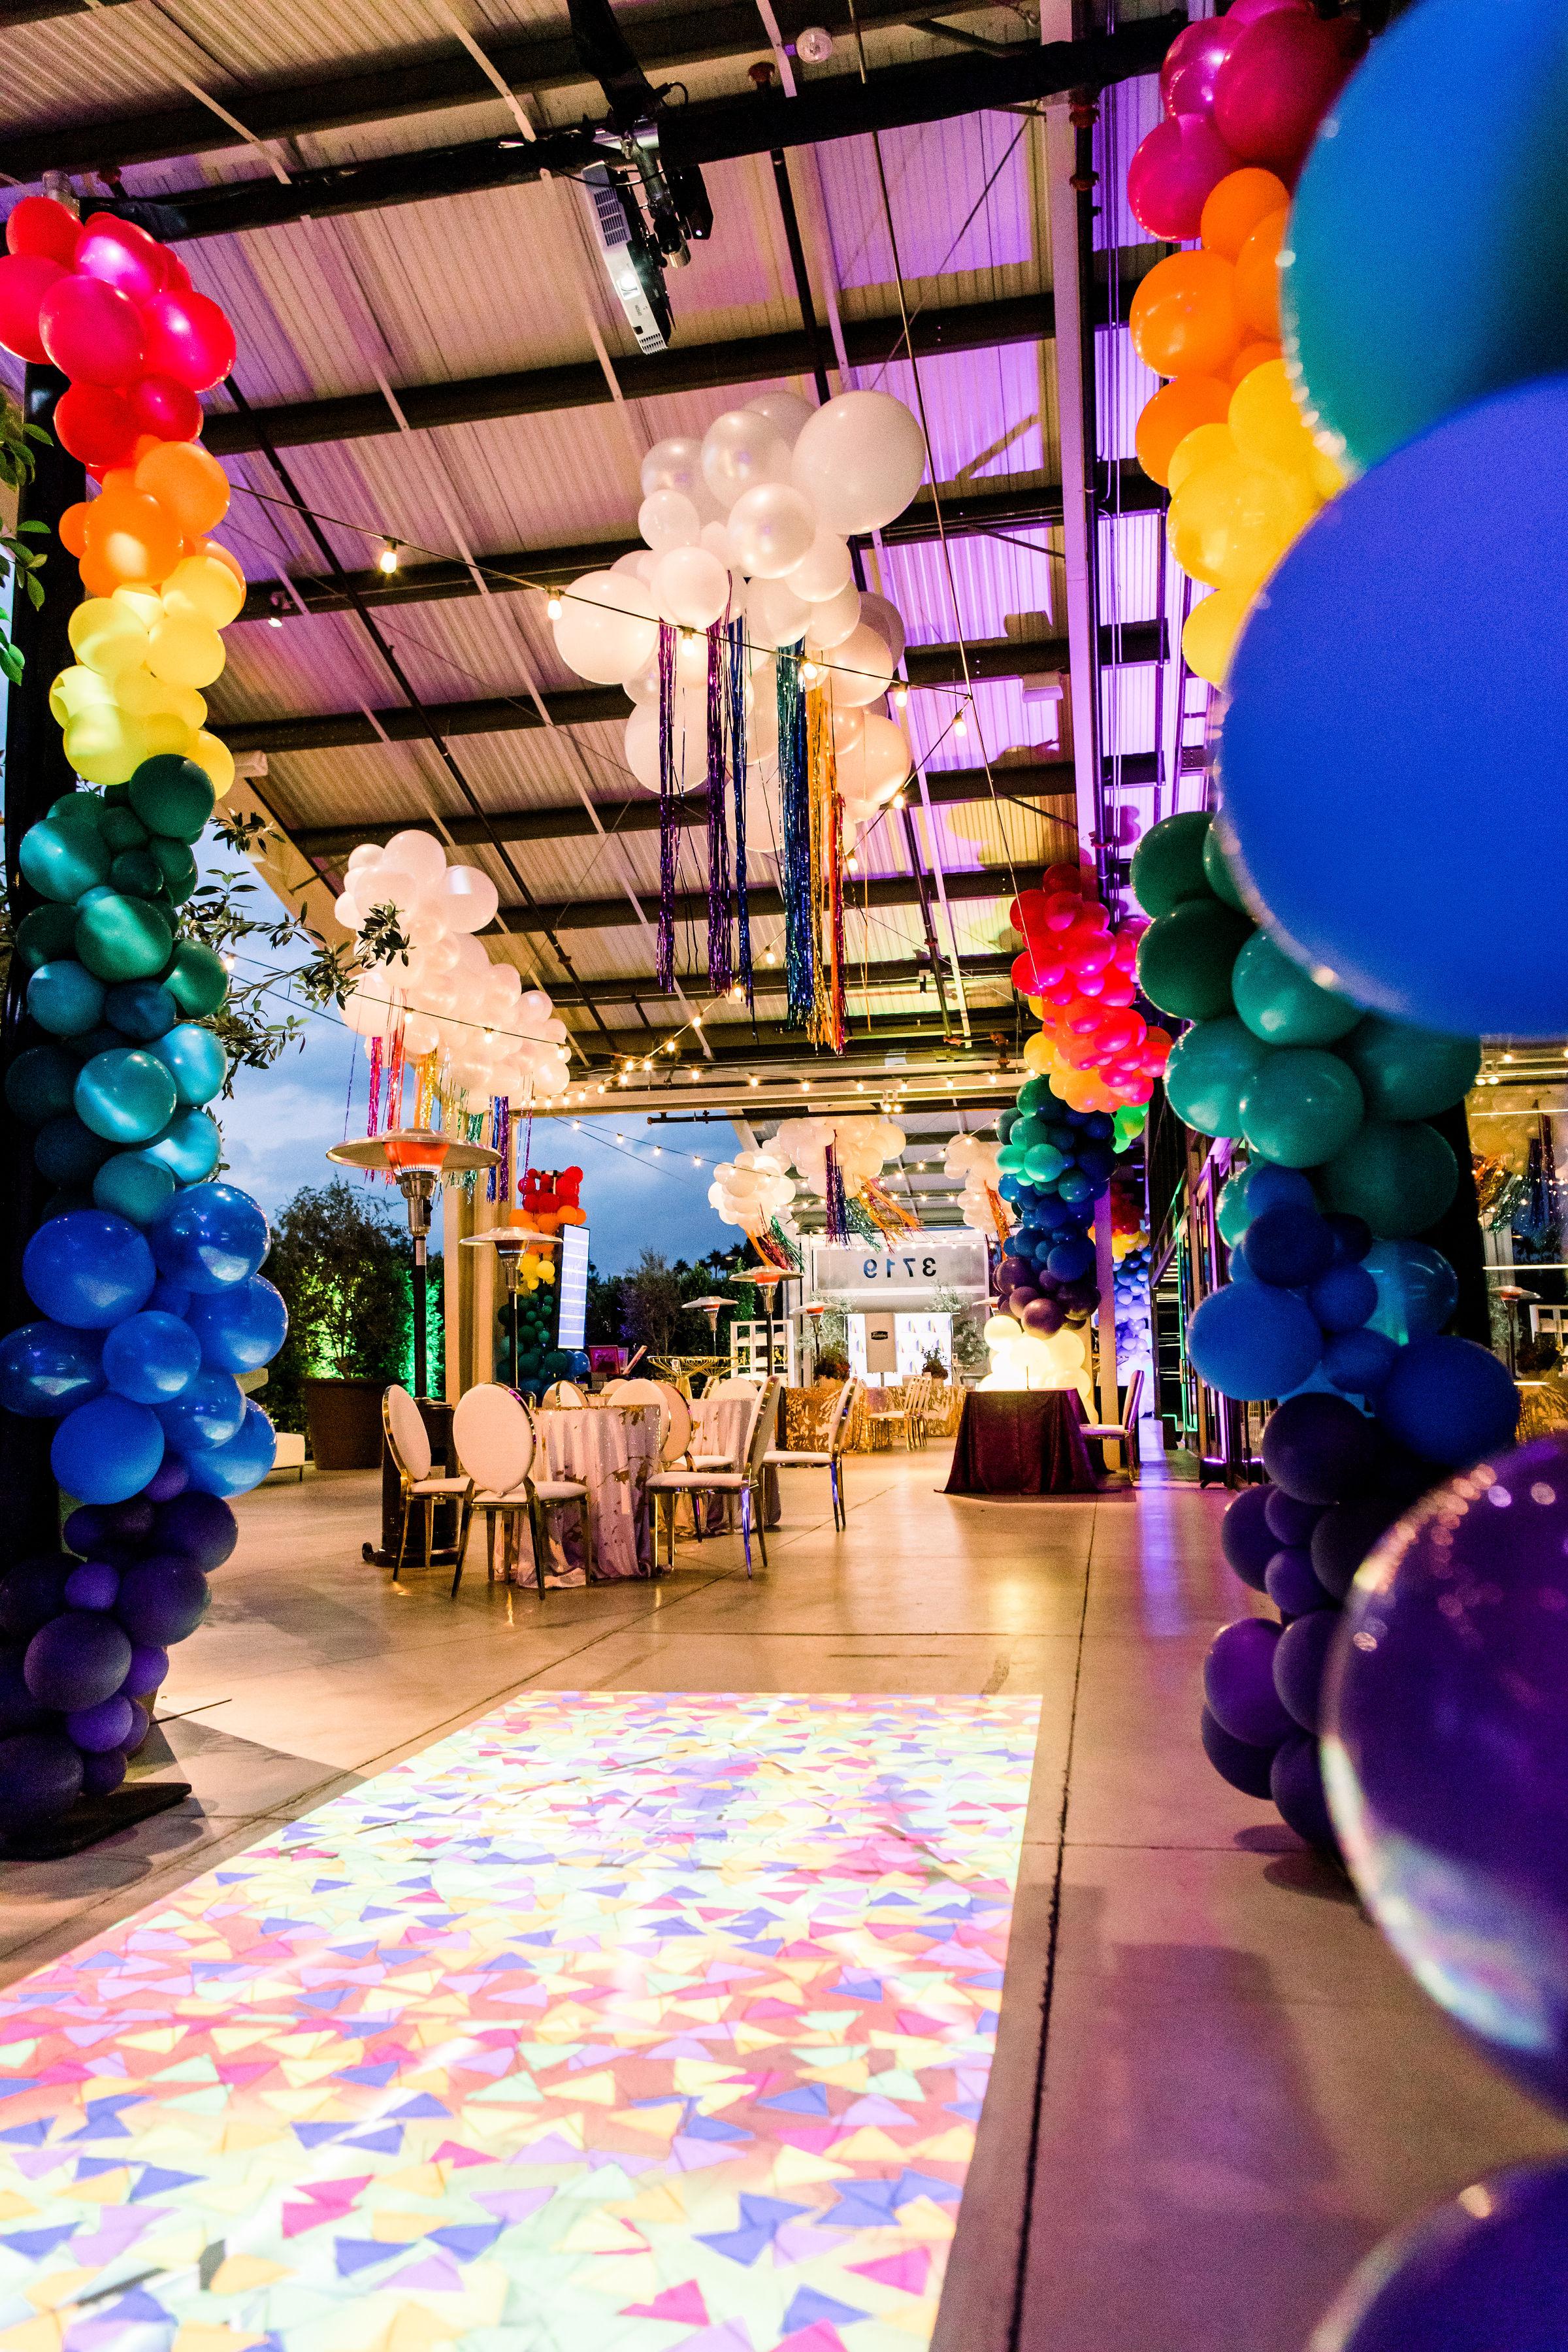 9 rainbow balloon garland balloon columns balloon clouds interactive light projection games rainbow bar mitzvah Life Design Events photos by Stephanie Heymann Photography.jpg